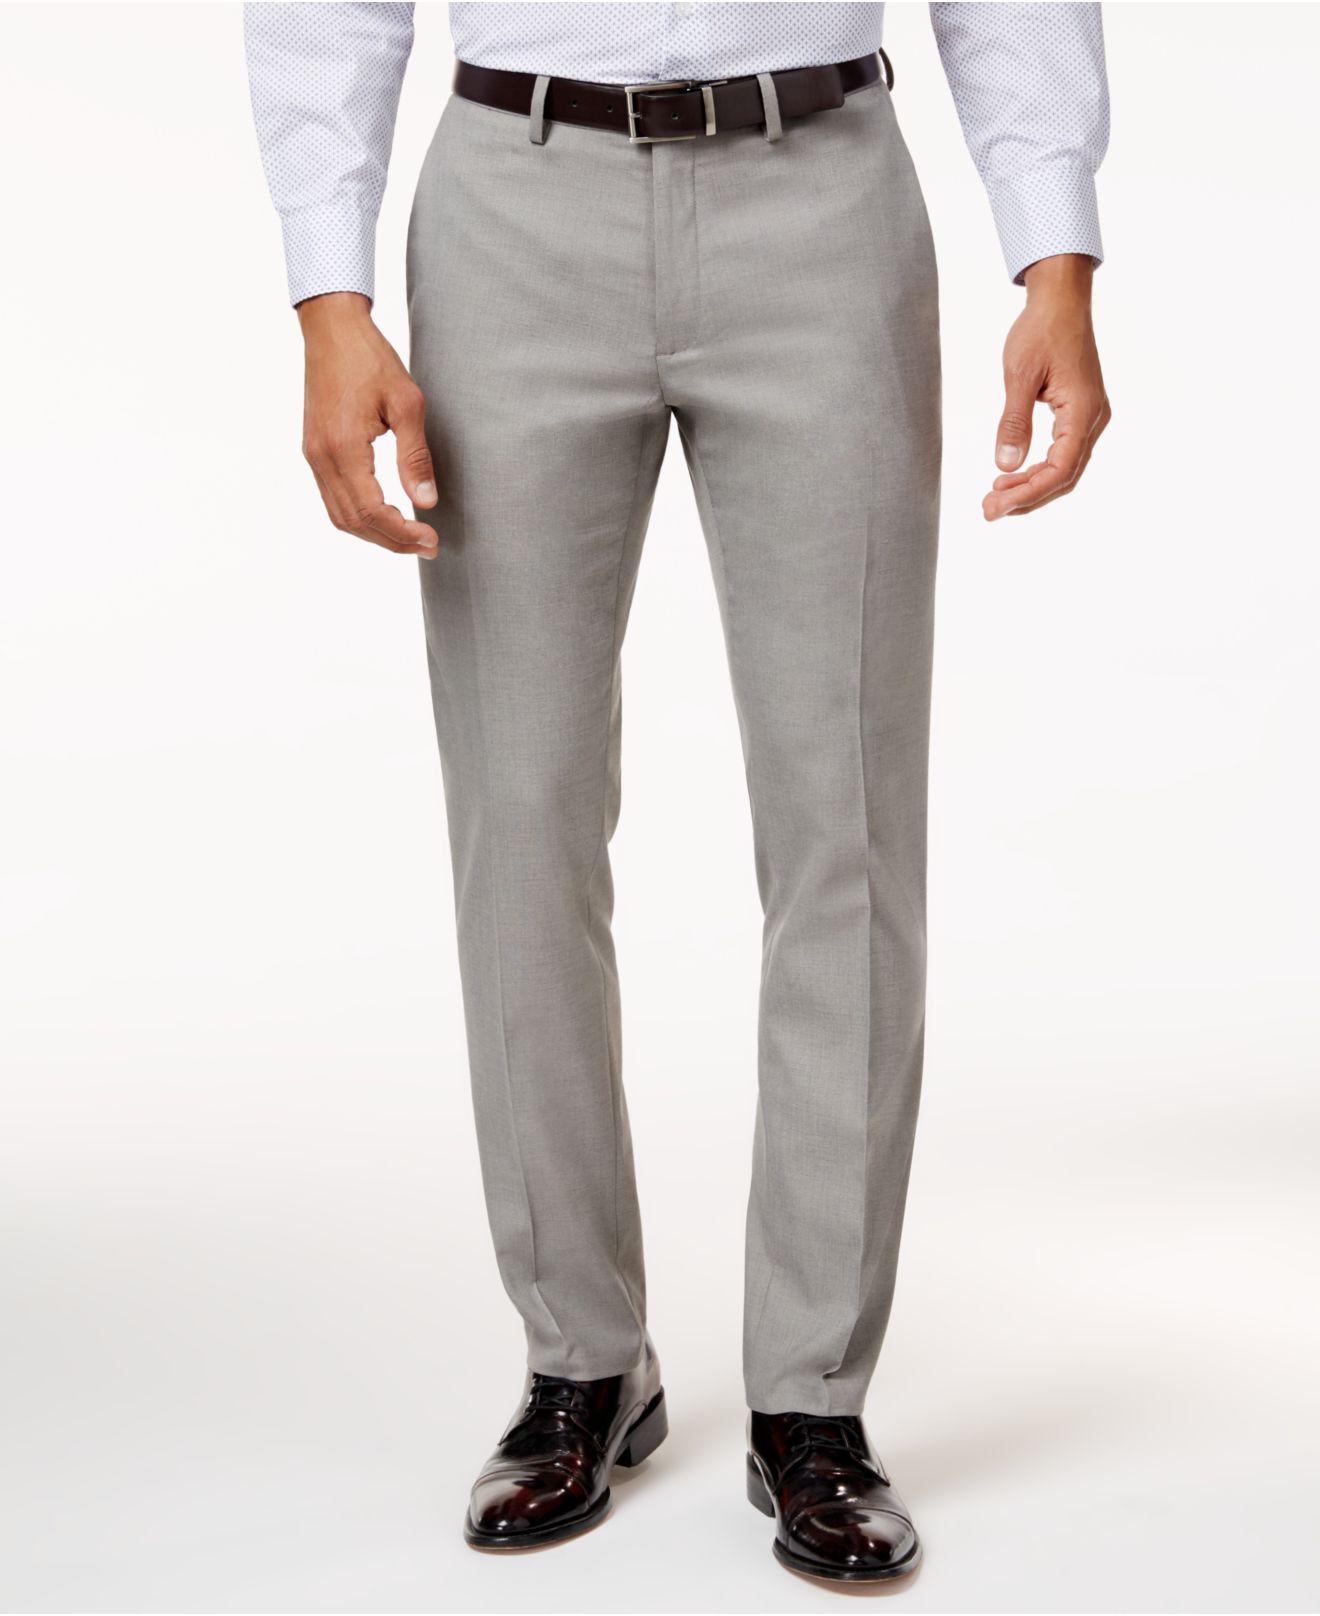 Straight-Fit Stretch Dress Pant Kenneth Cole Reaction QBmMyn2YA